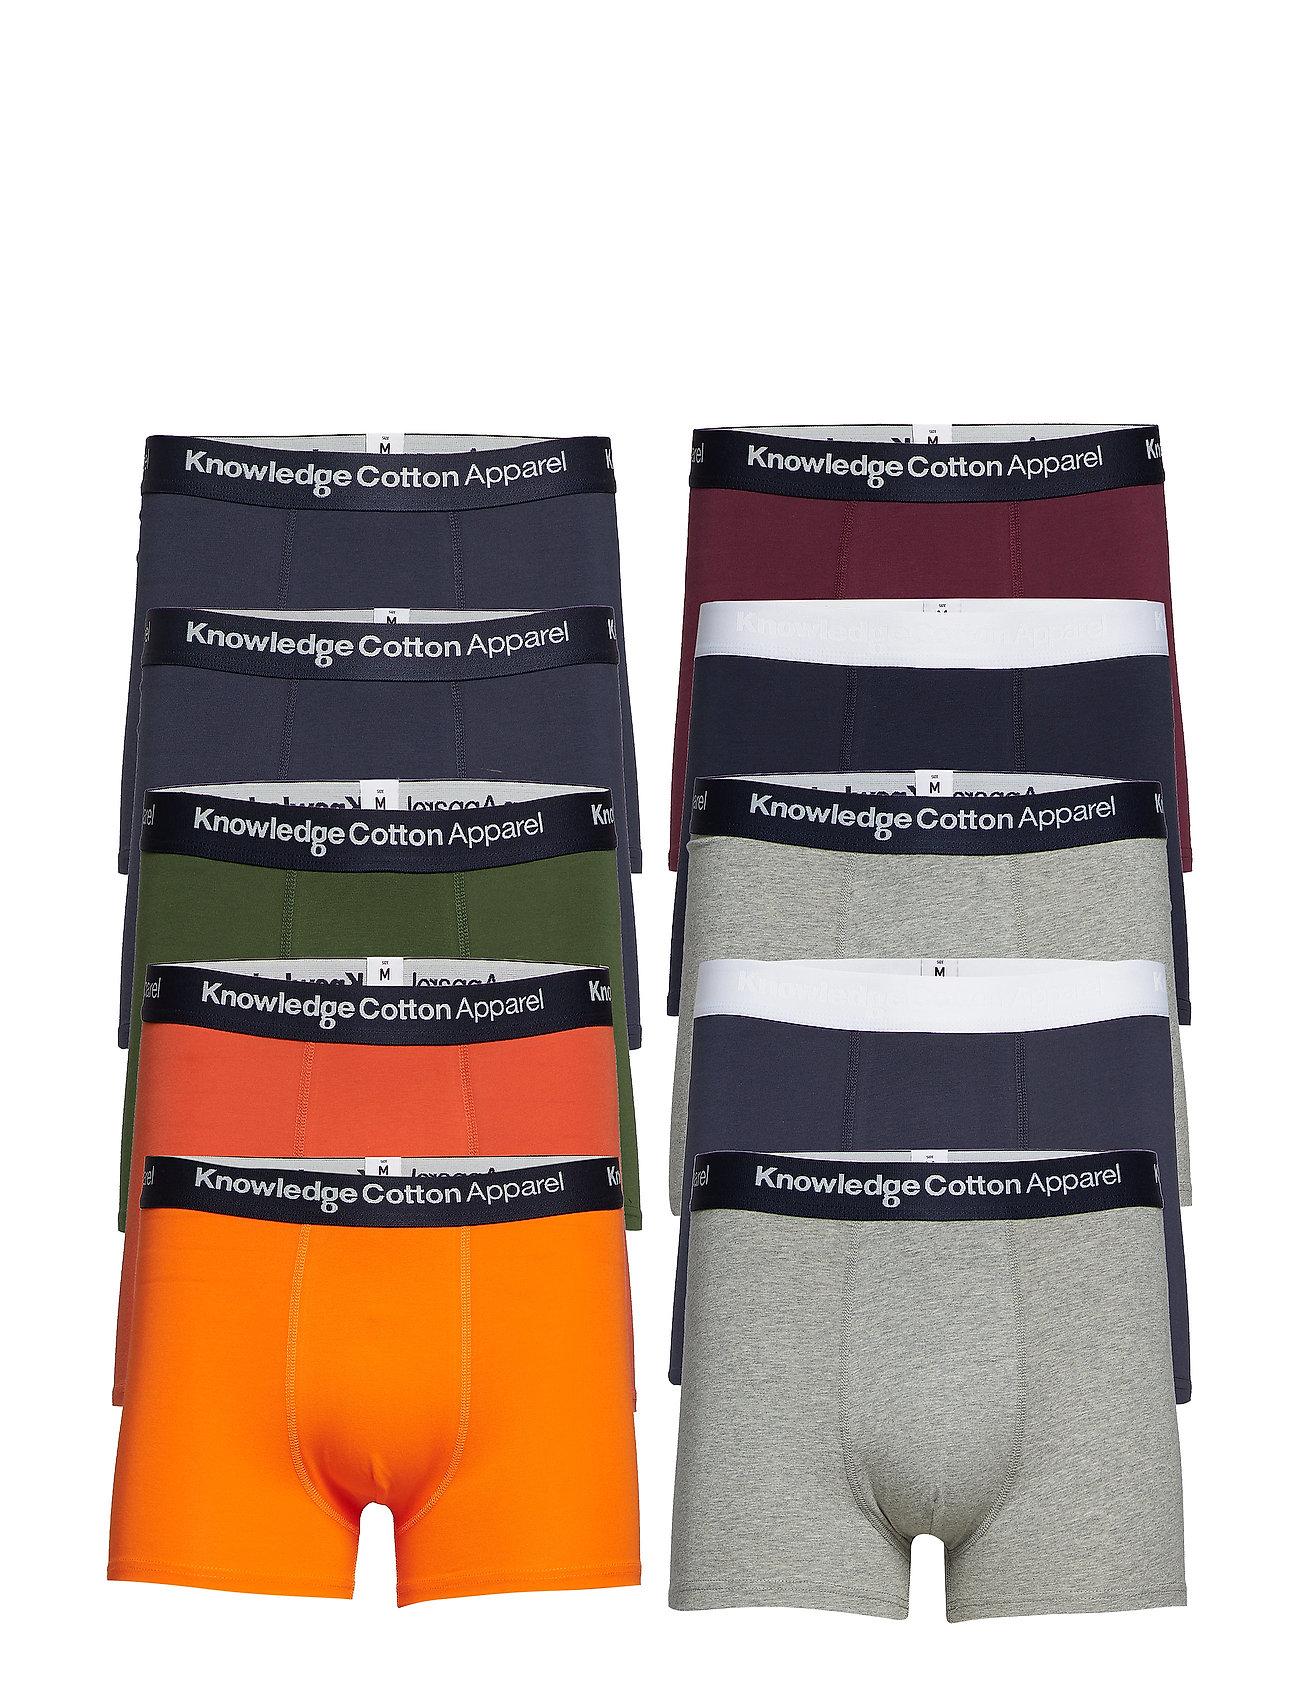 Knowledge Cotton Apparel MAPLE 10 pack underwear - GOTS/Vega - TOTAL ECLIPSE